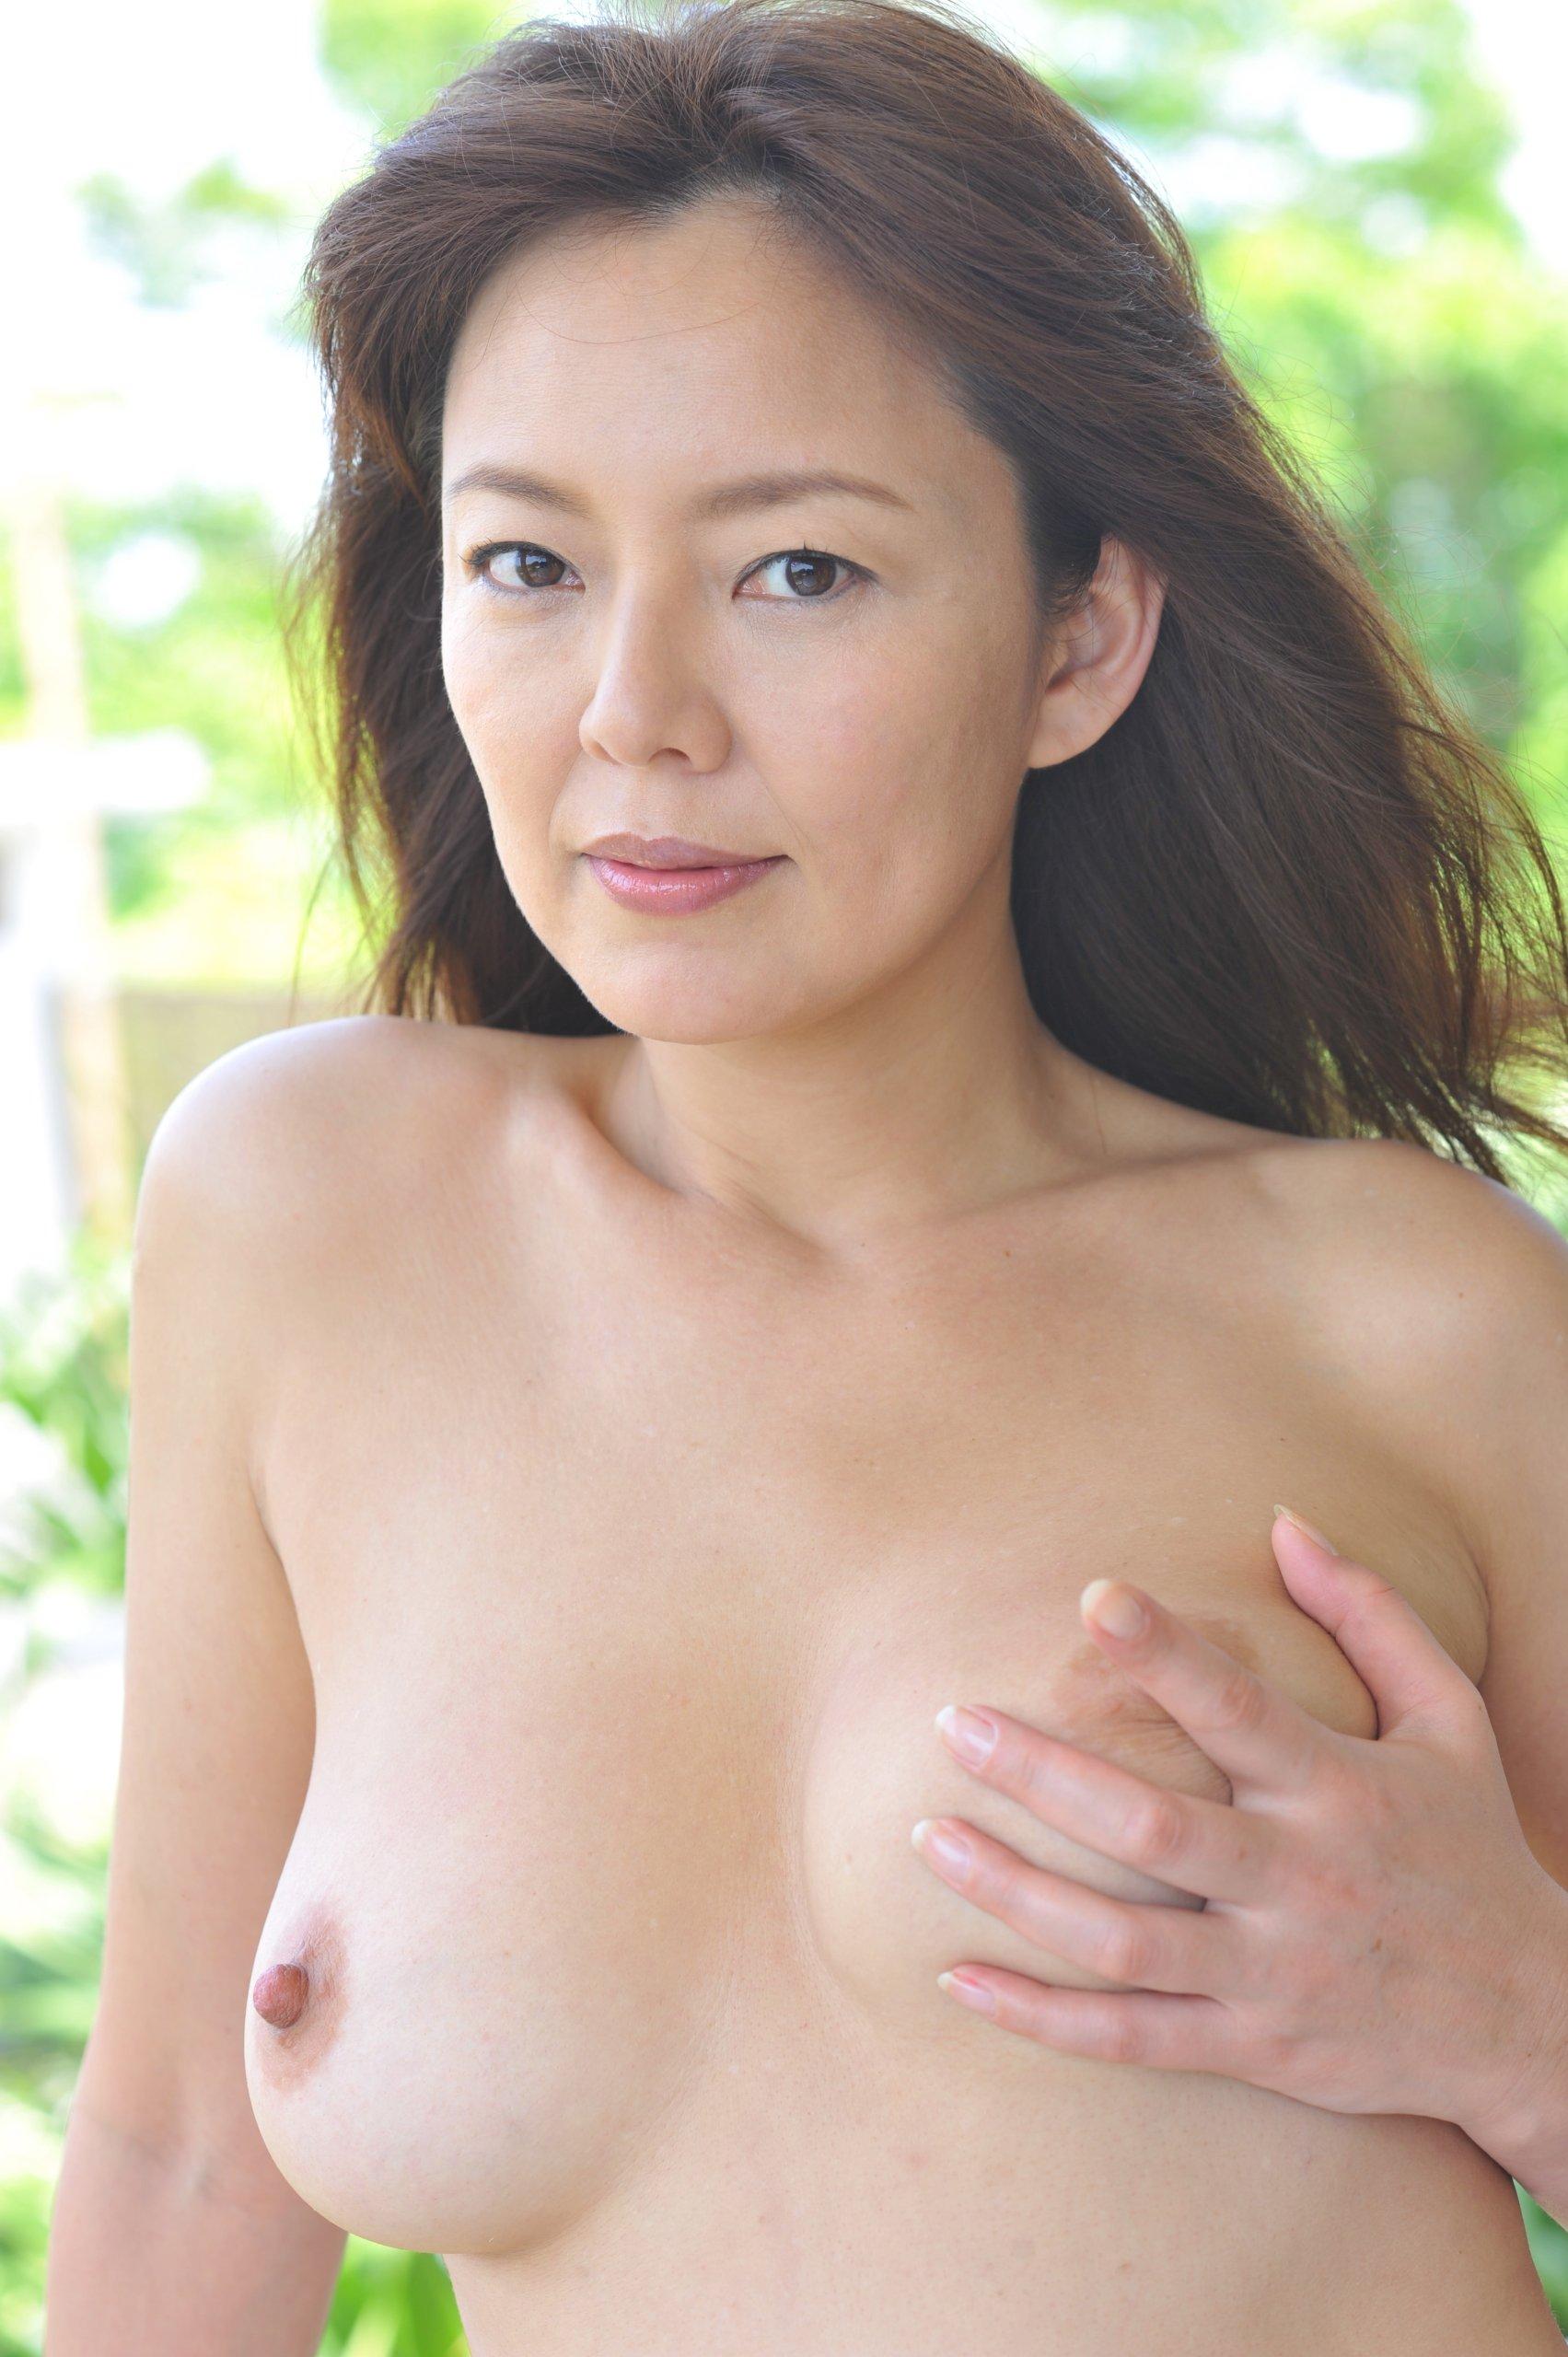 Nude singapore lesbian